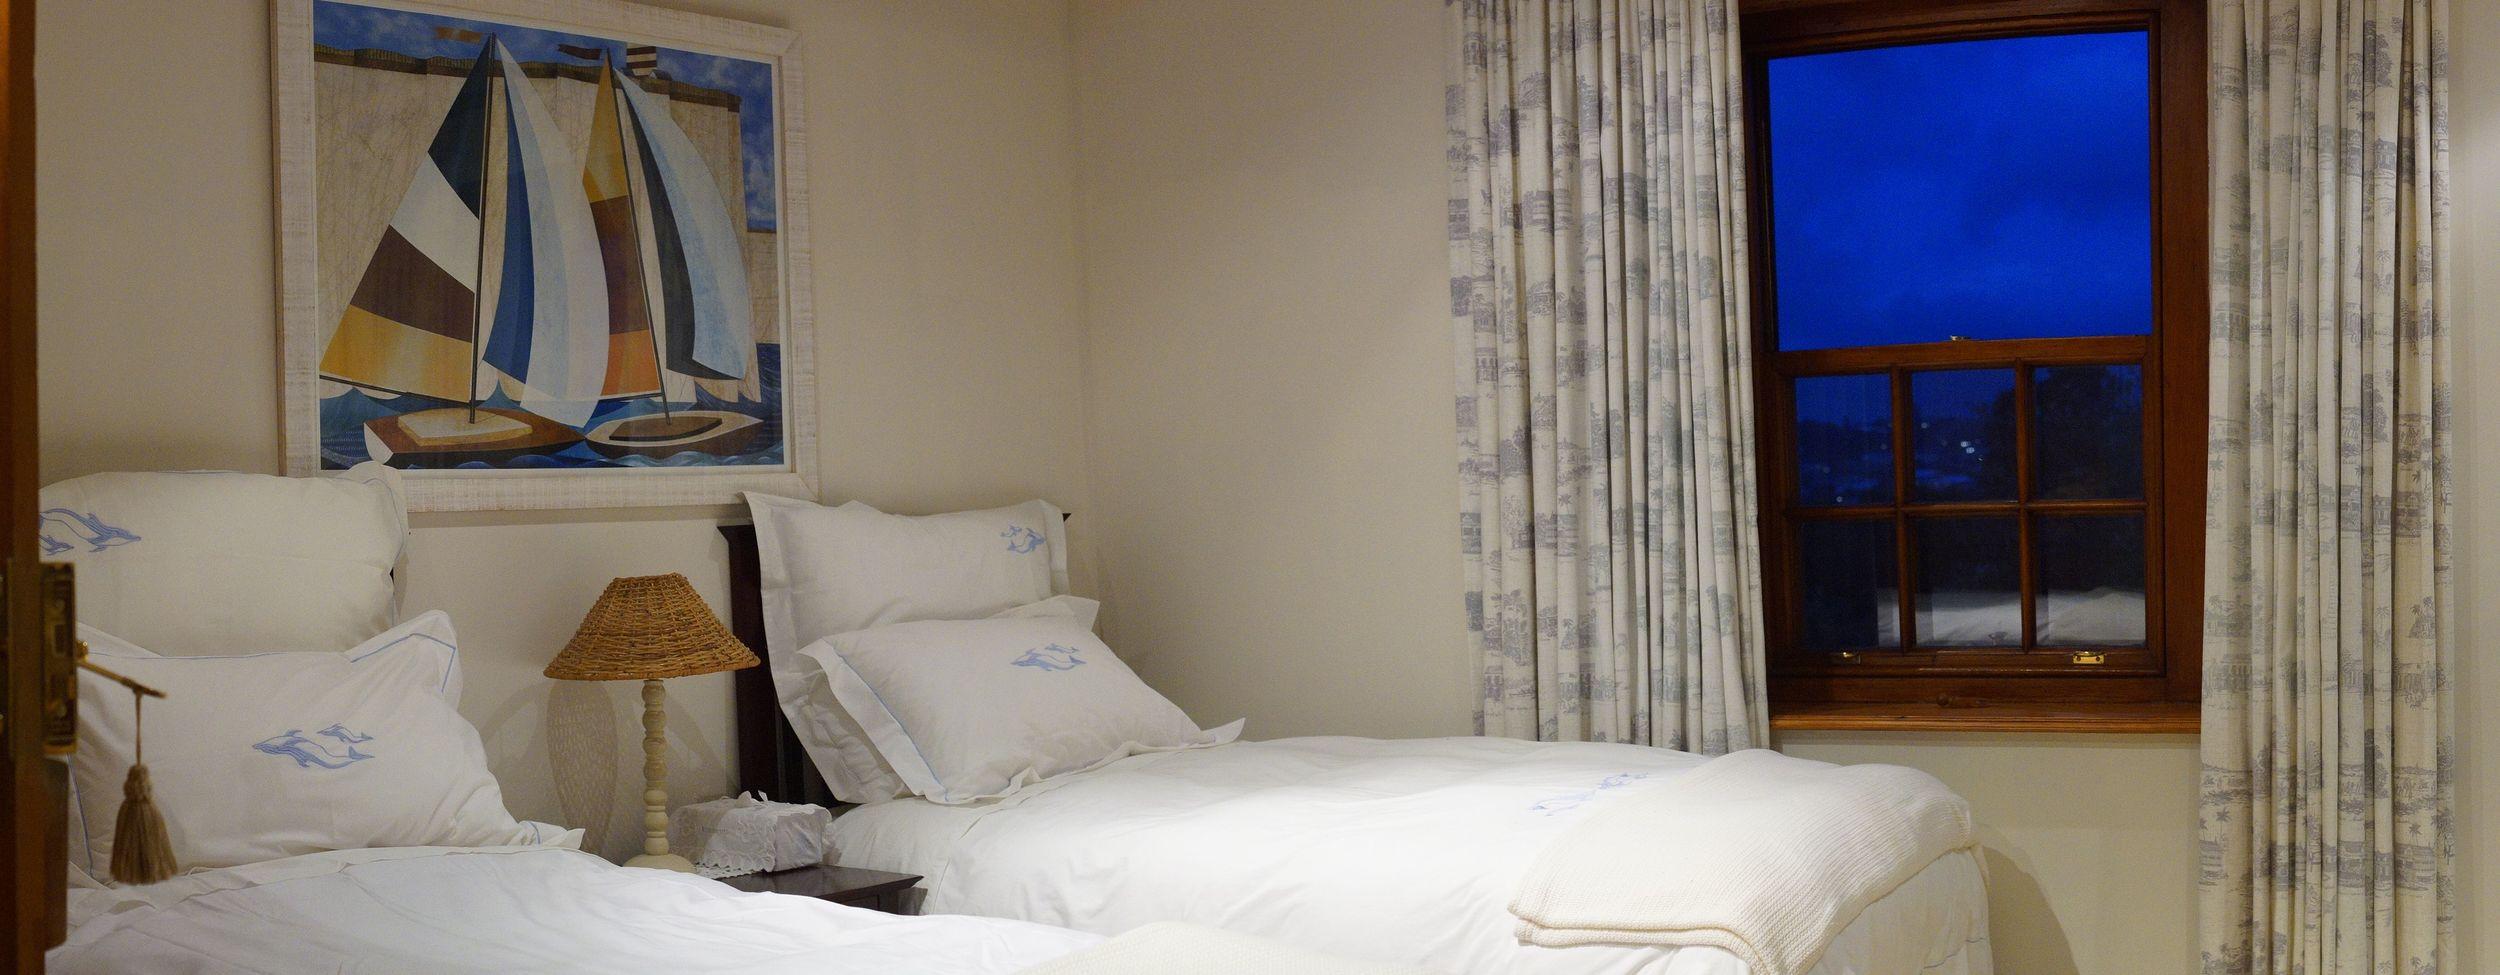 SA bedroom masculine.jpg